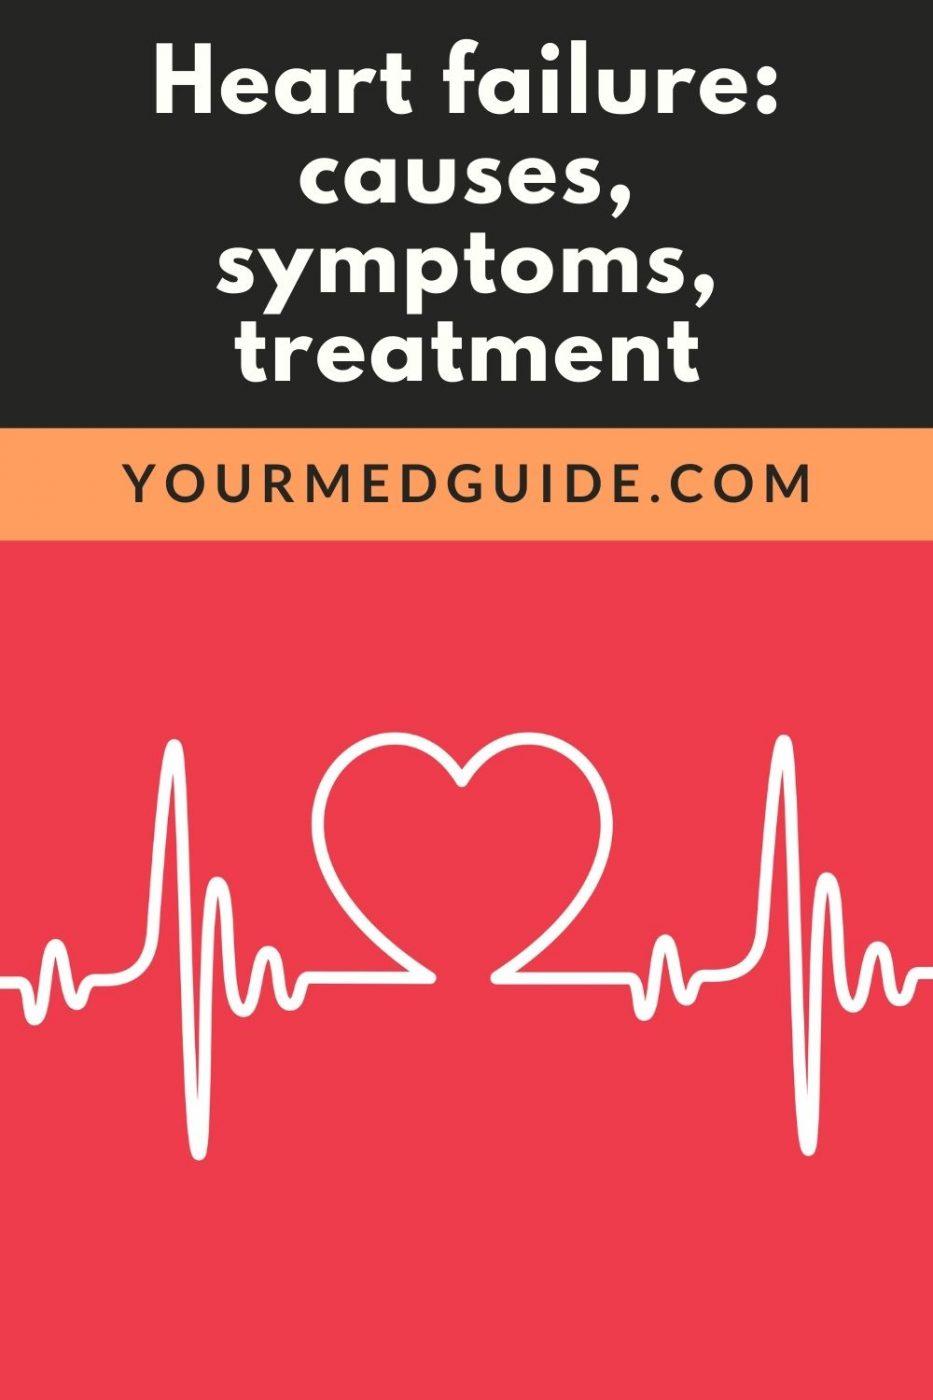 Heart failure_ symptoms, causes, treatment